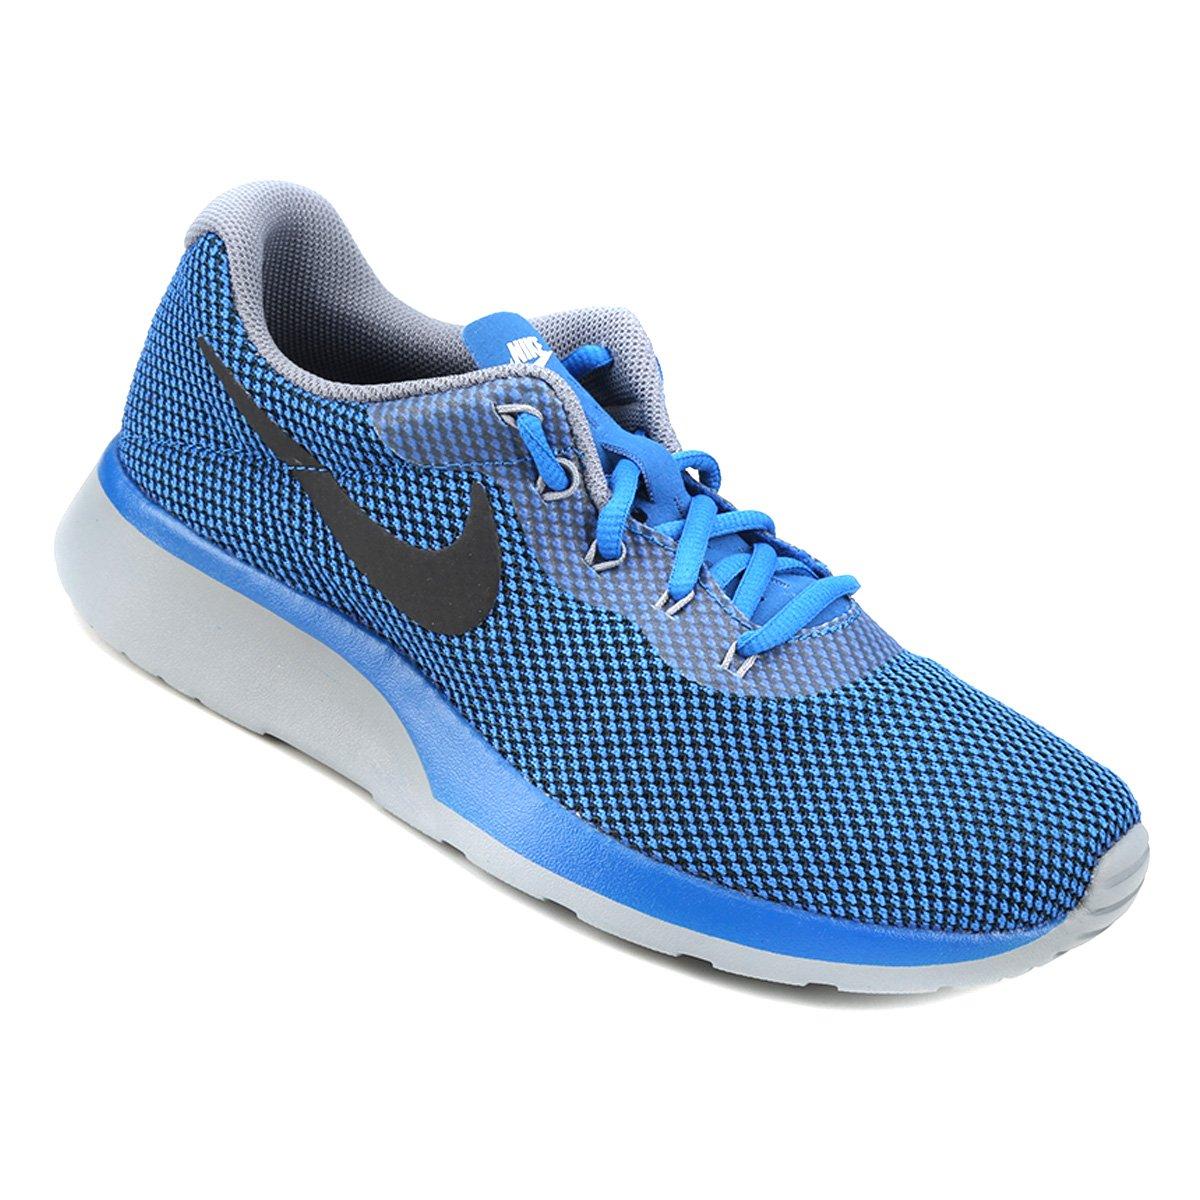 9399027673f Tênis Nike Tanjun Racer Masculino - Compre Agora